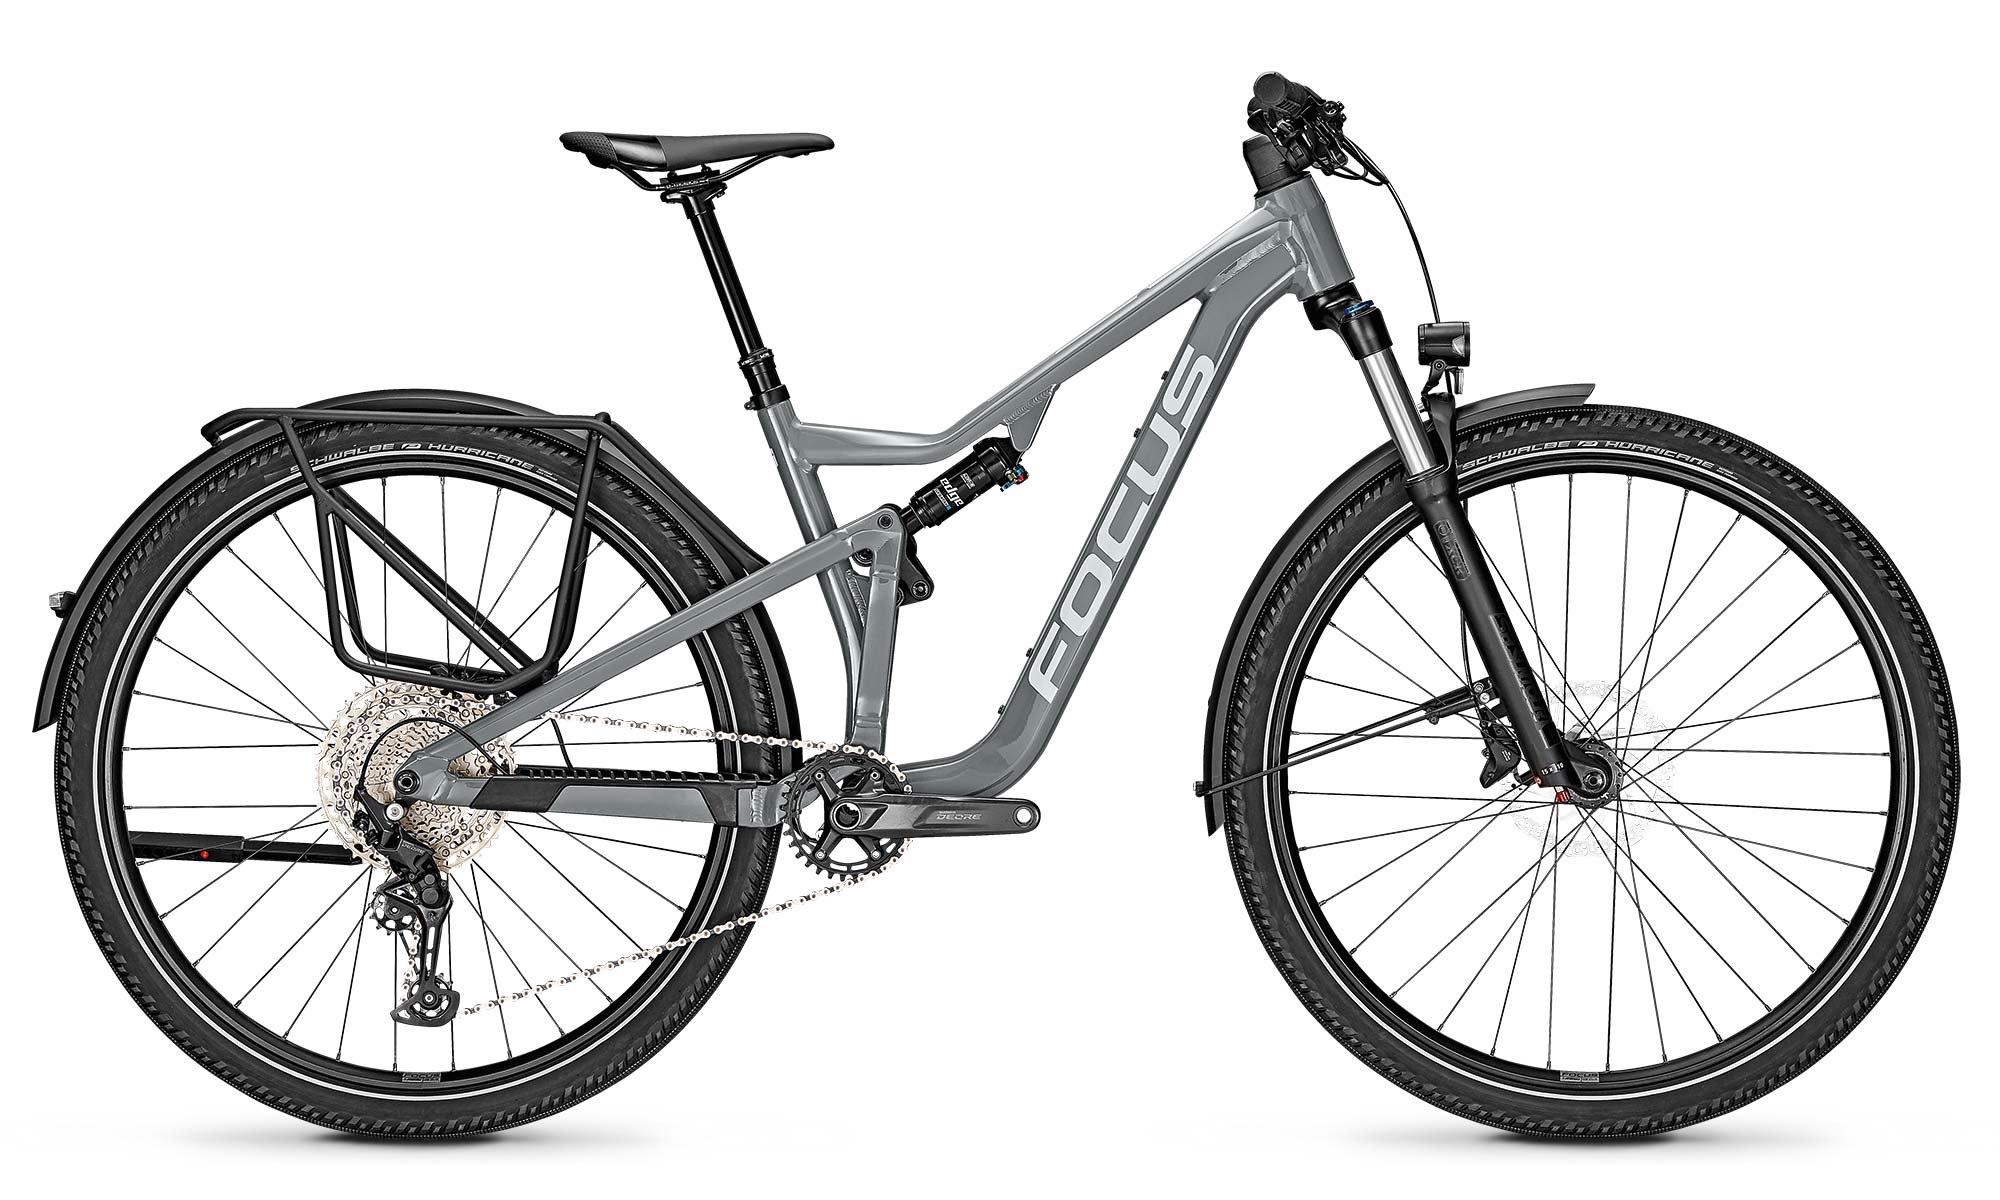 2021 Focus THRON affordable alloy 130mm 29er trail MTB mountain bike,6.8 EQP